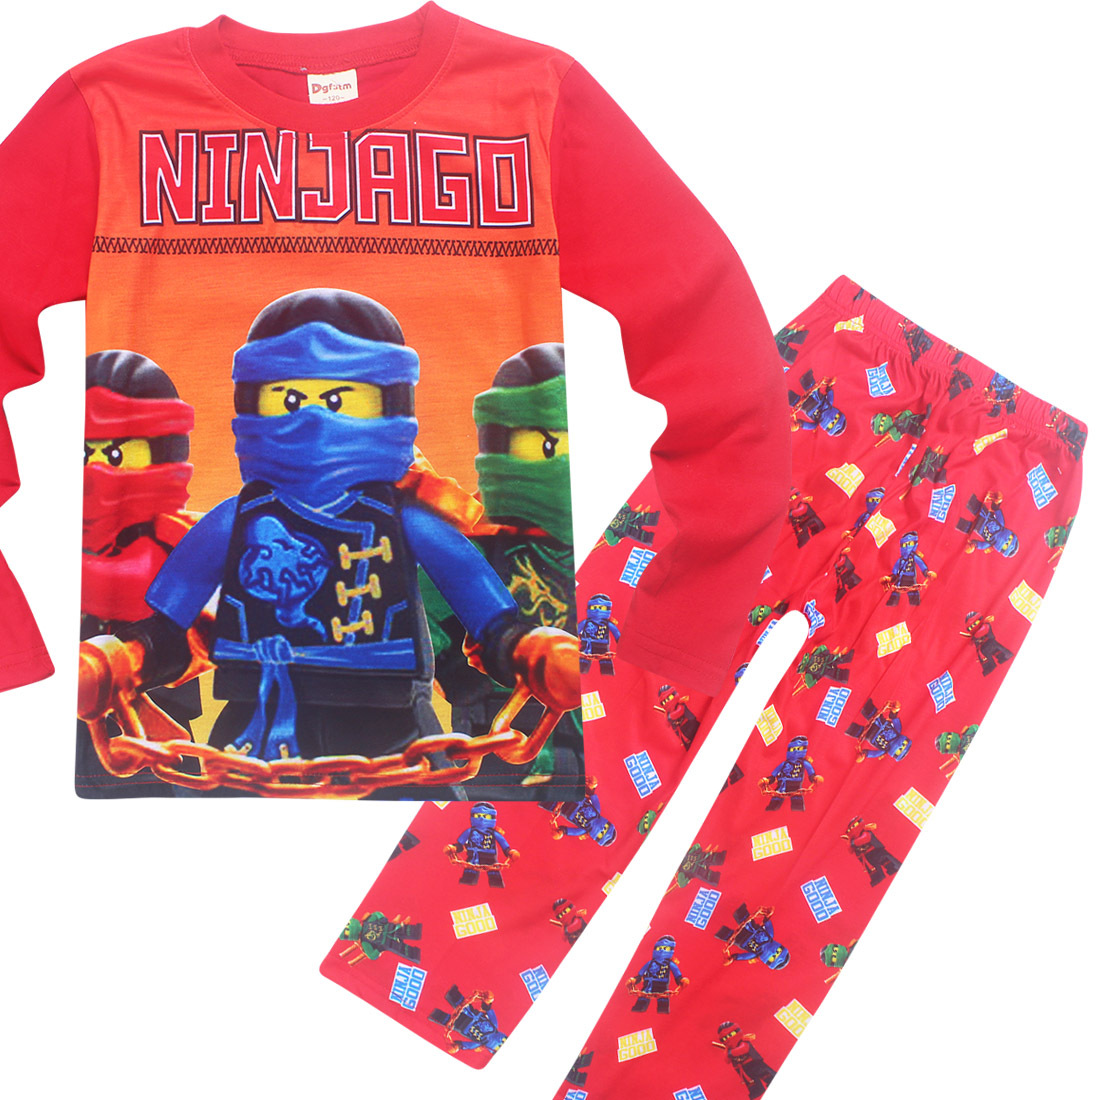 Ninja Christmas Pajamas For Boys Baby Girls Pyjamas Toddler Kds Boy Ninjago Sleepwear Halloween Party Clothing Children Pijamas